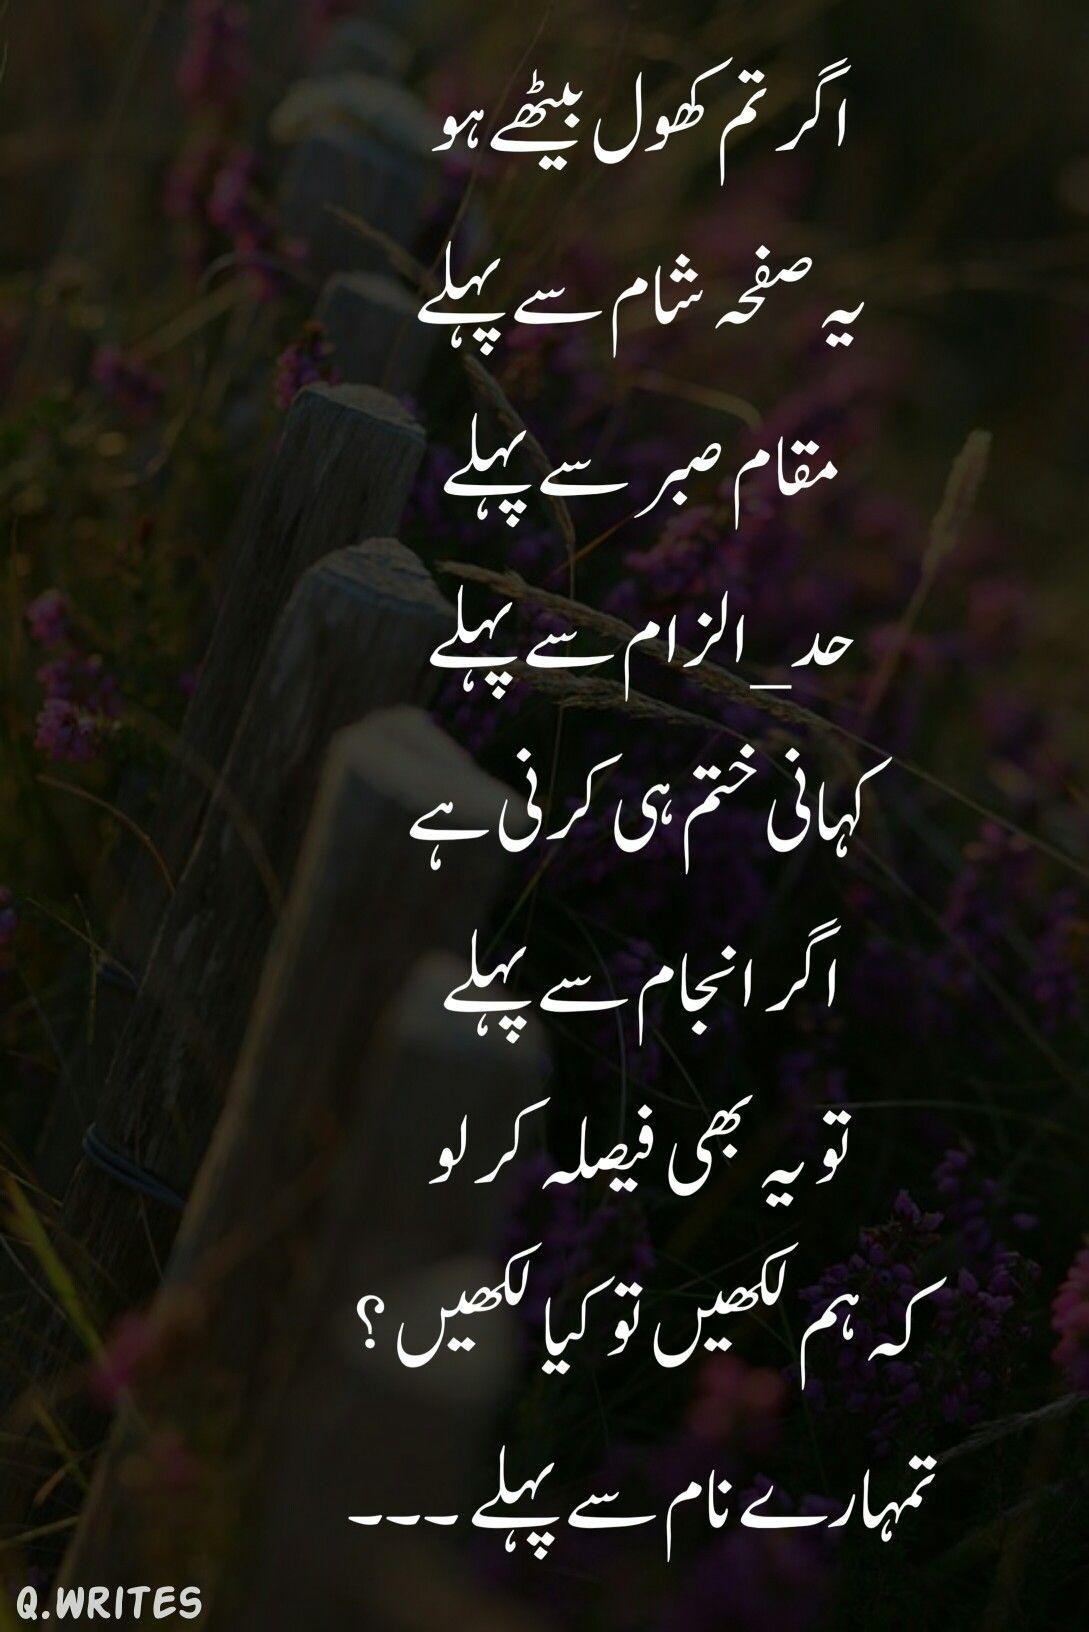 Urdupoetryurdupoetryurdu Poetrysad Poetrysadpoetrysadpoetry